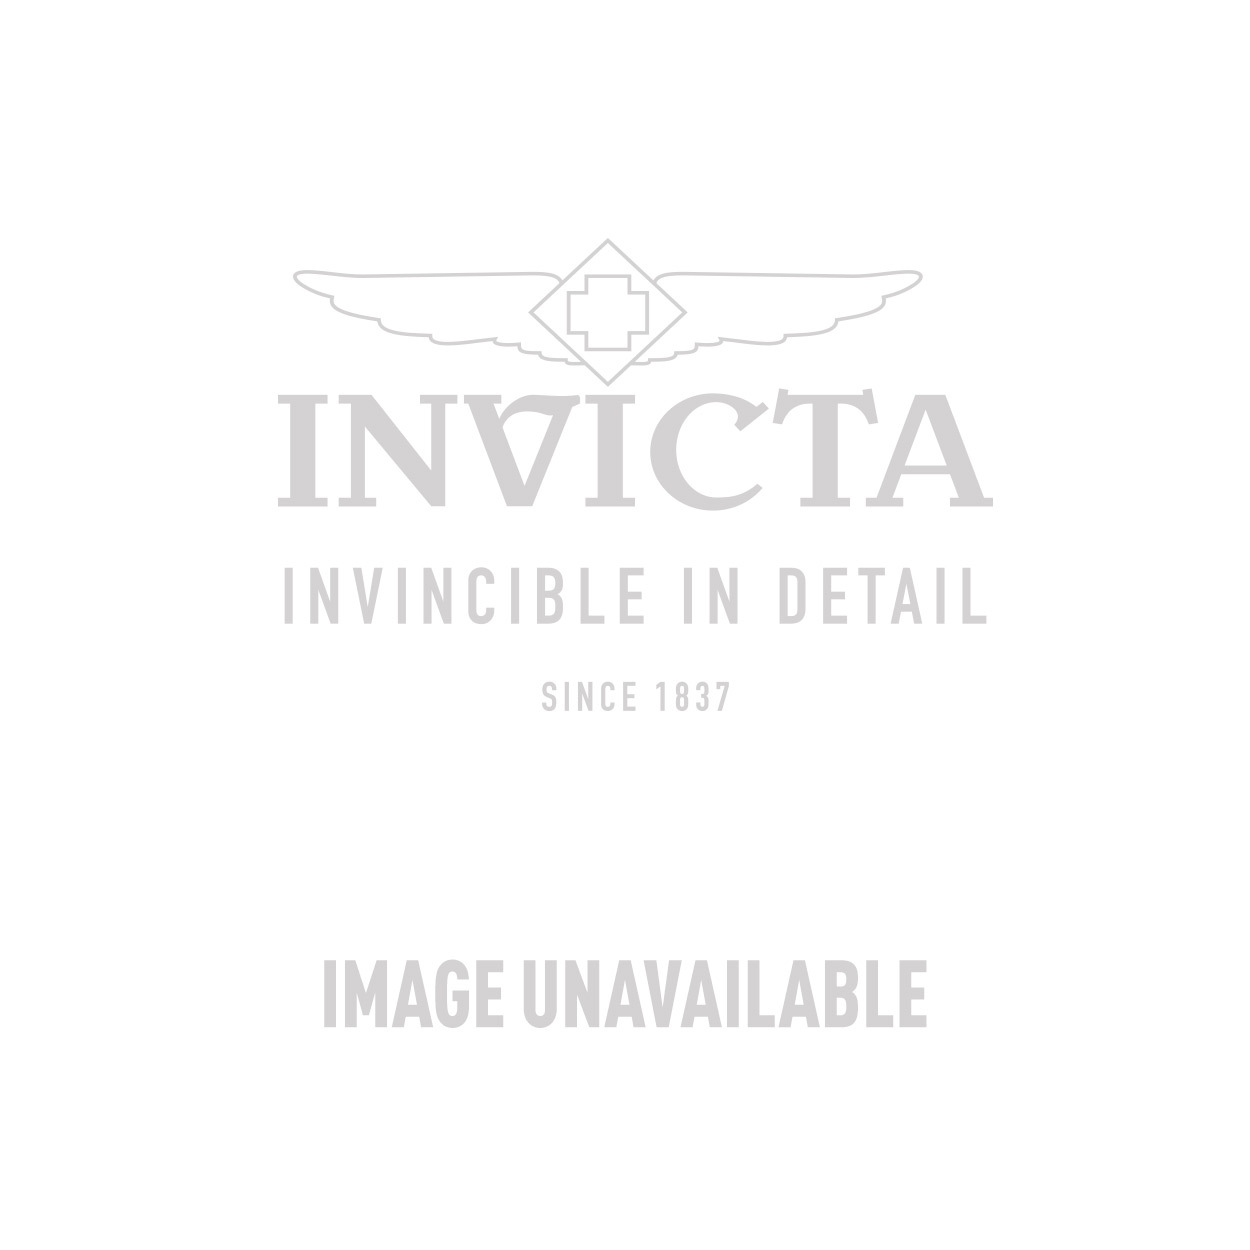 Invicta Bolt Swiss Made Quartz Watch - Gunmetal, Stainless Steel case with Steel, Gunmetal, Blue tone Stainless Steel, Polyurethane band - Model 14403